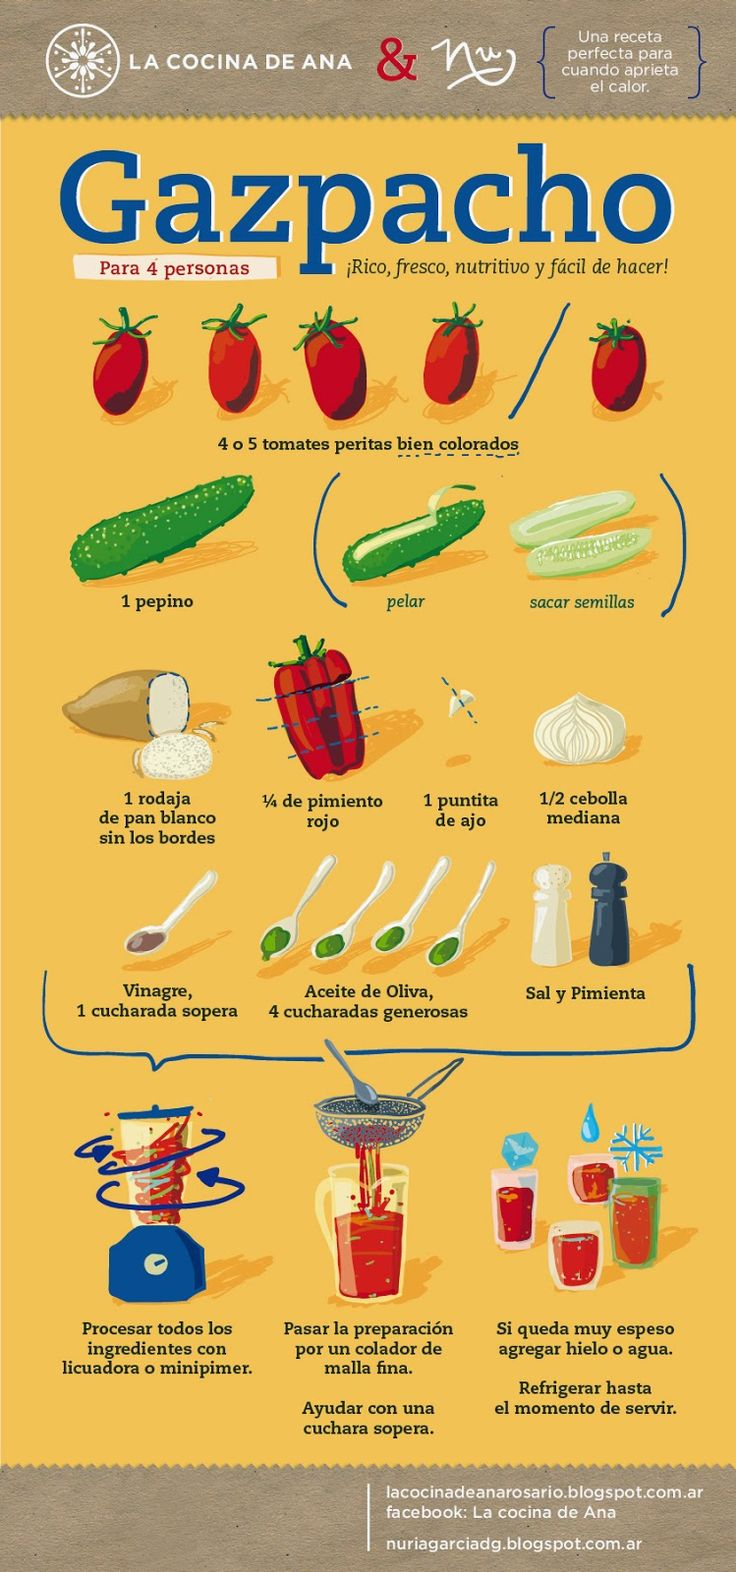 Gazpacho_La-Cocina-de-Ana.jpg 749×1.600 píxeles